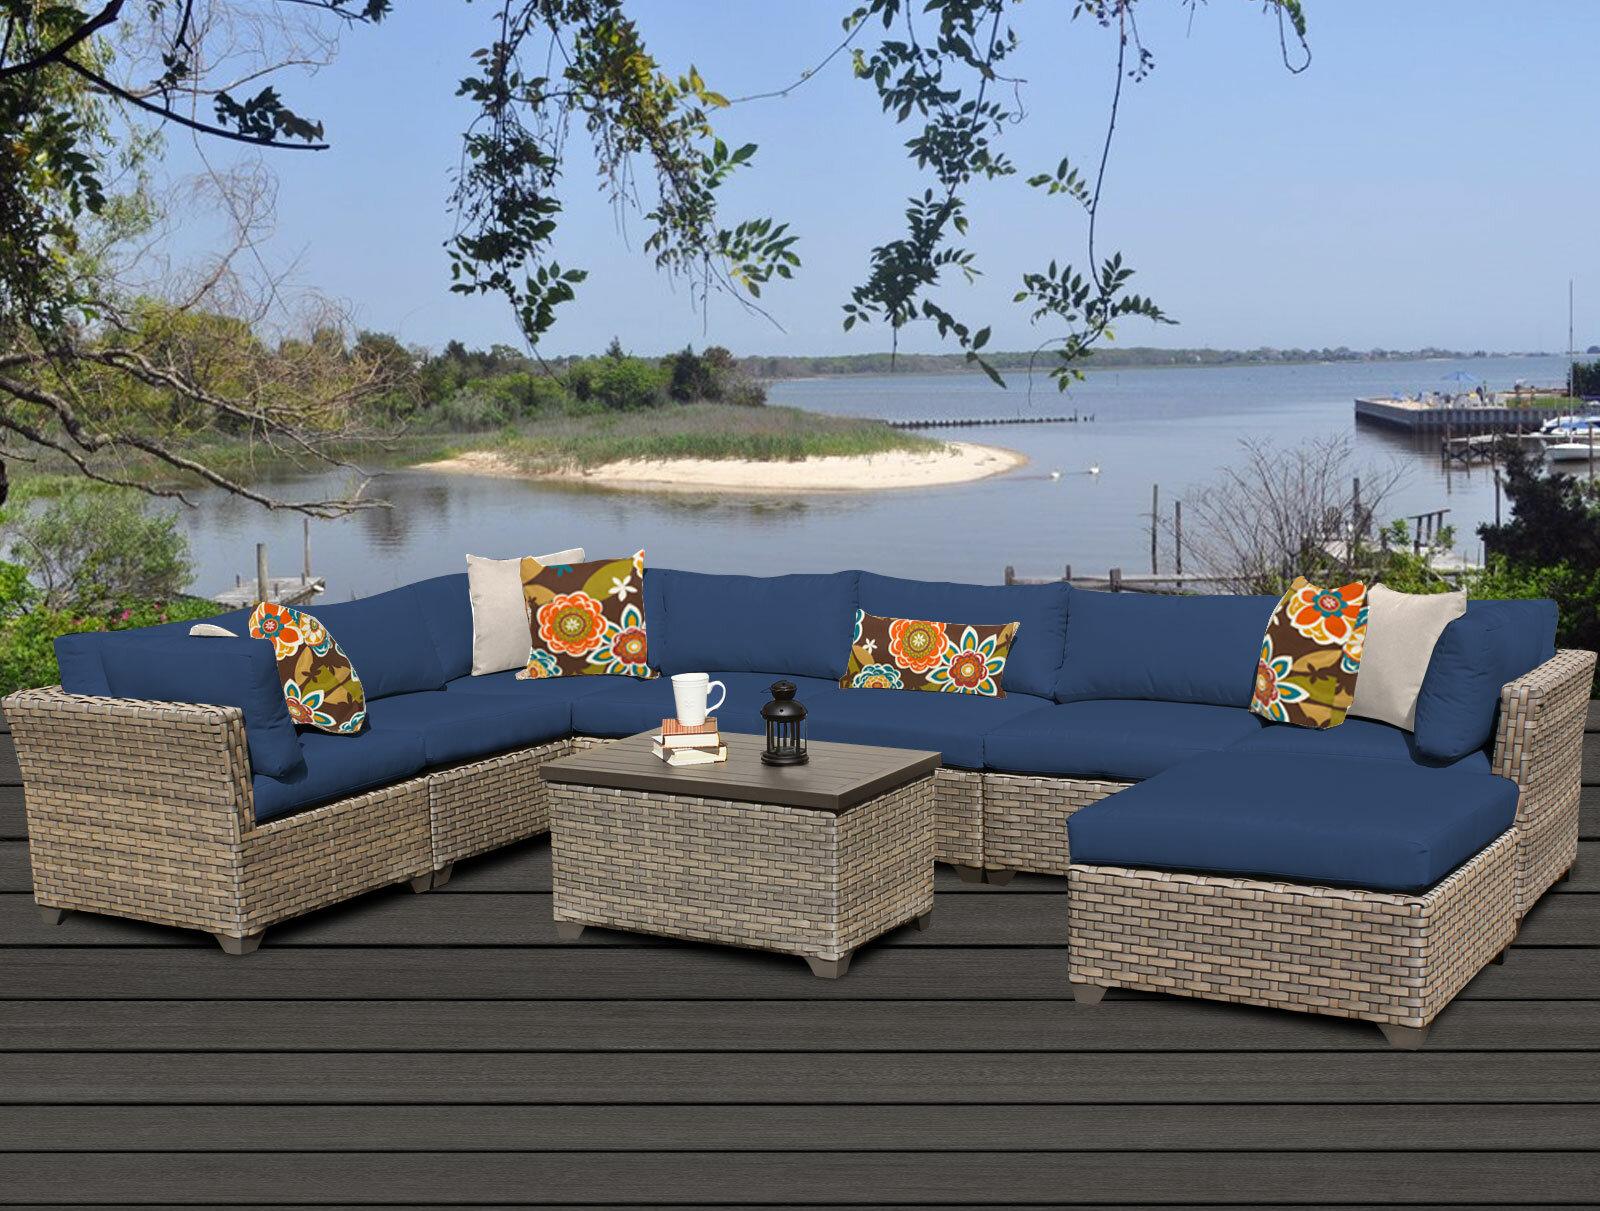 Phenomenal 9 Piece Outdoor Furniture Wayfair Download Free Architecture Designs Crovemadebymaigaardcom